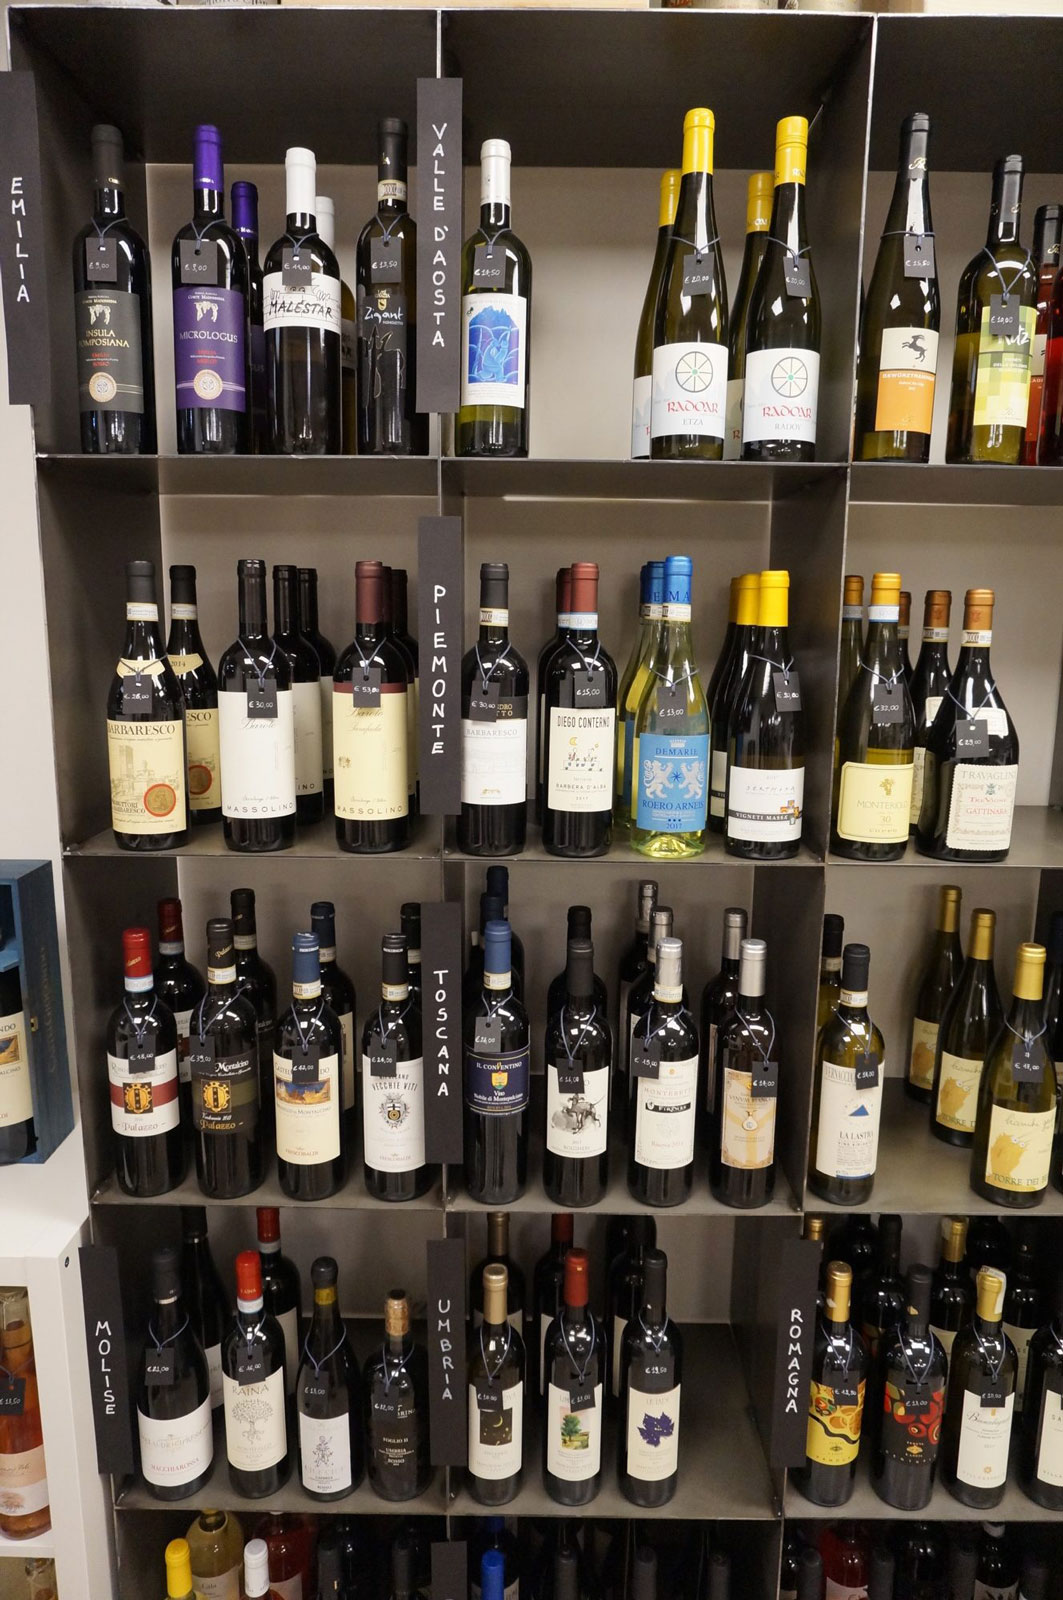 Vini italiani divisi per regione in Enoteca Botrytis